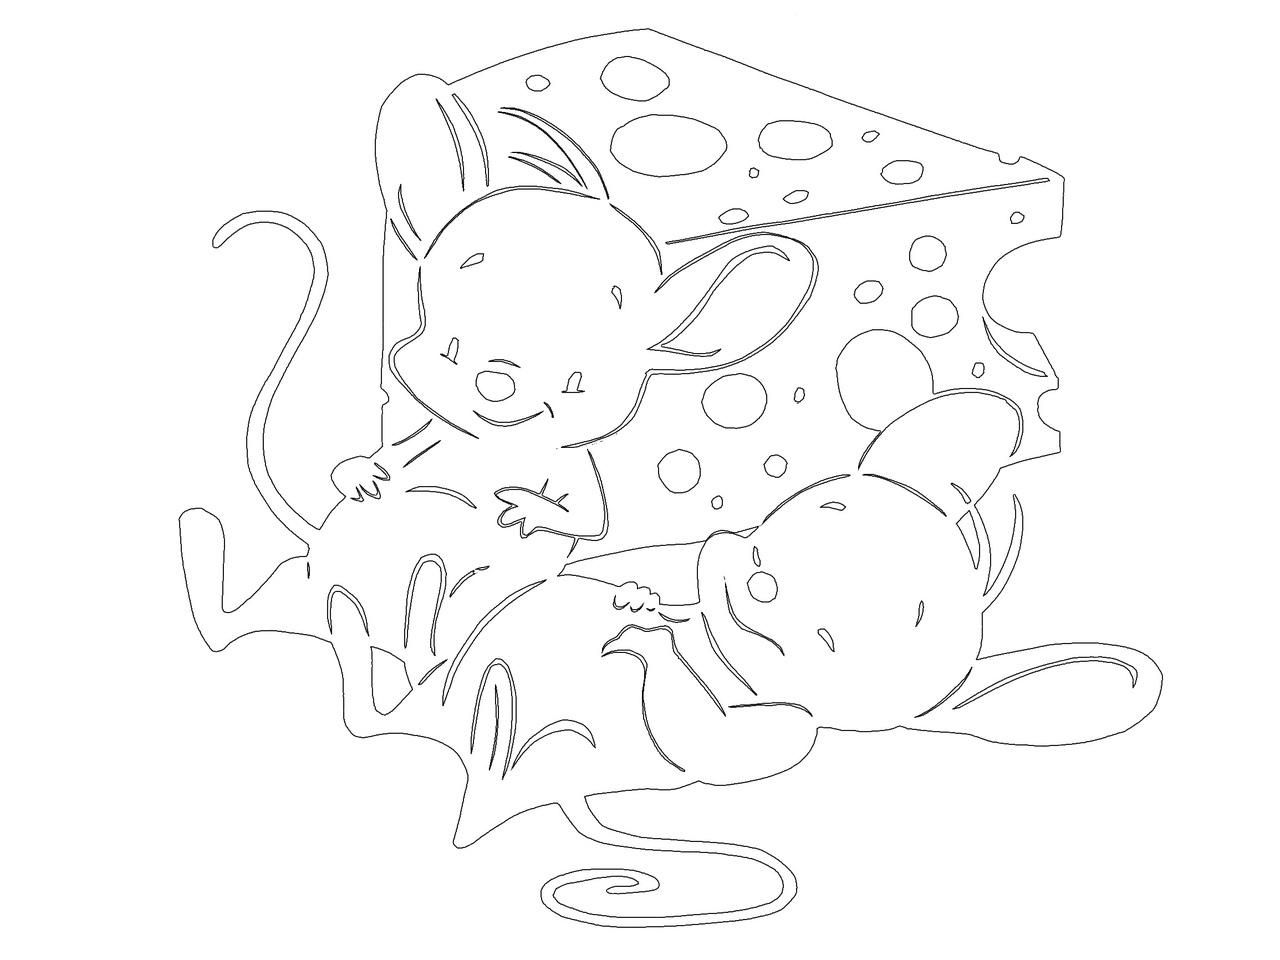 Шаблоны на окна с мышами